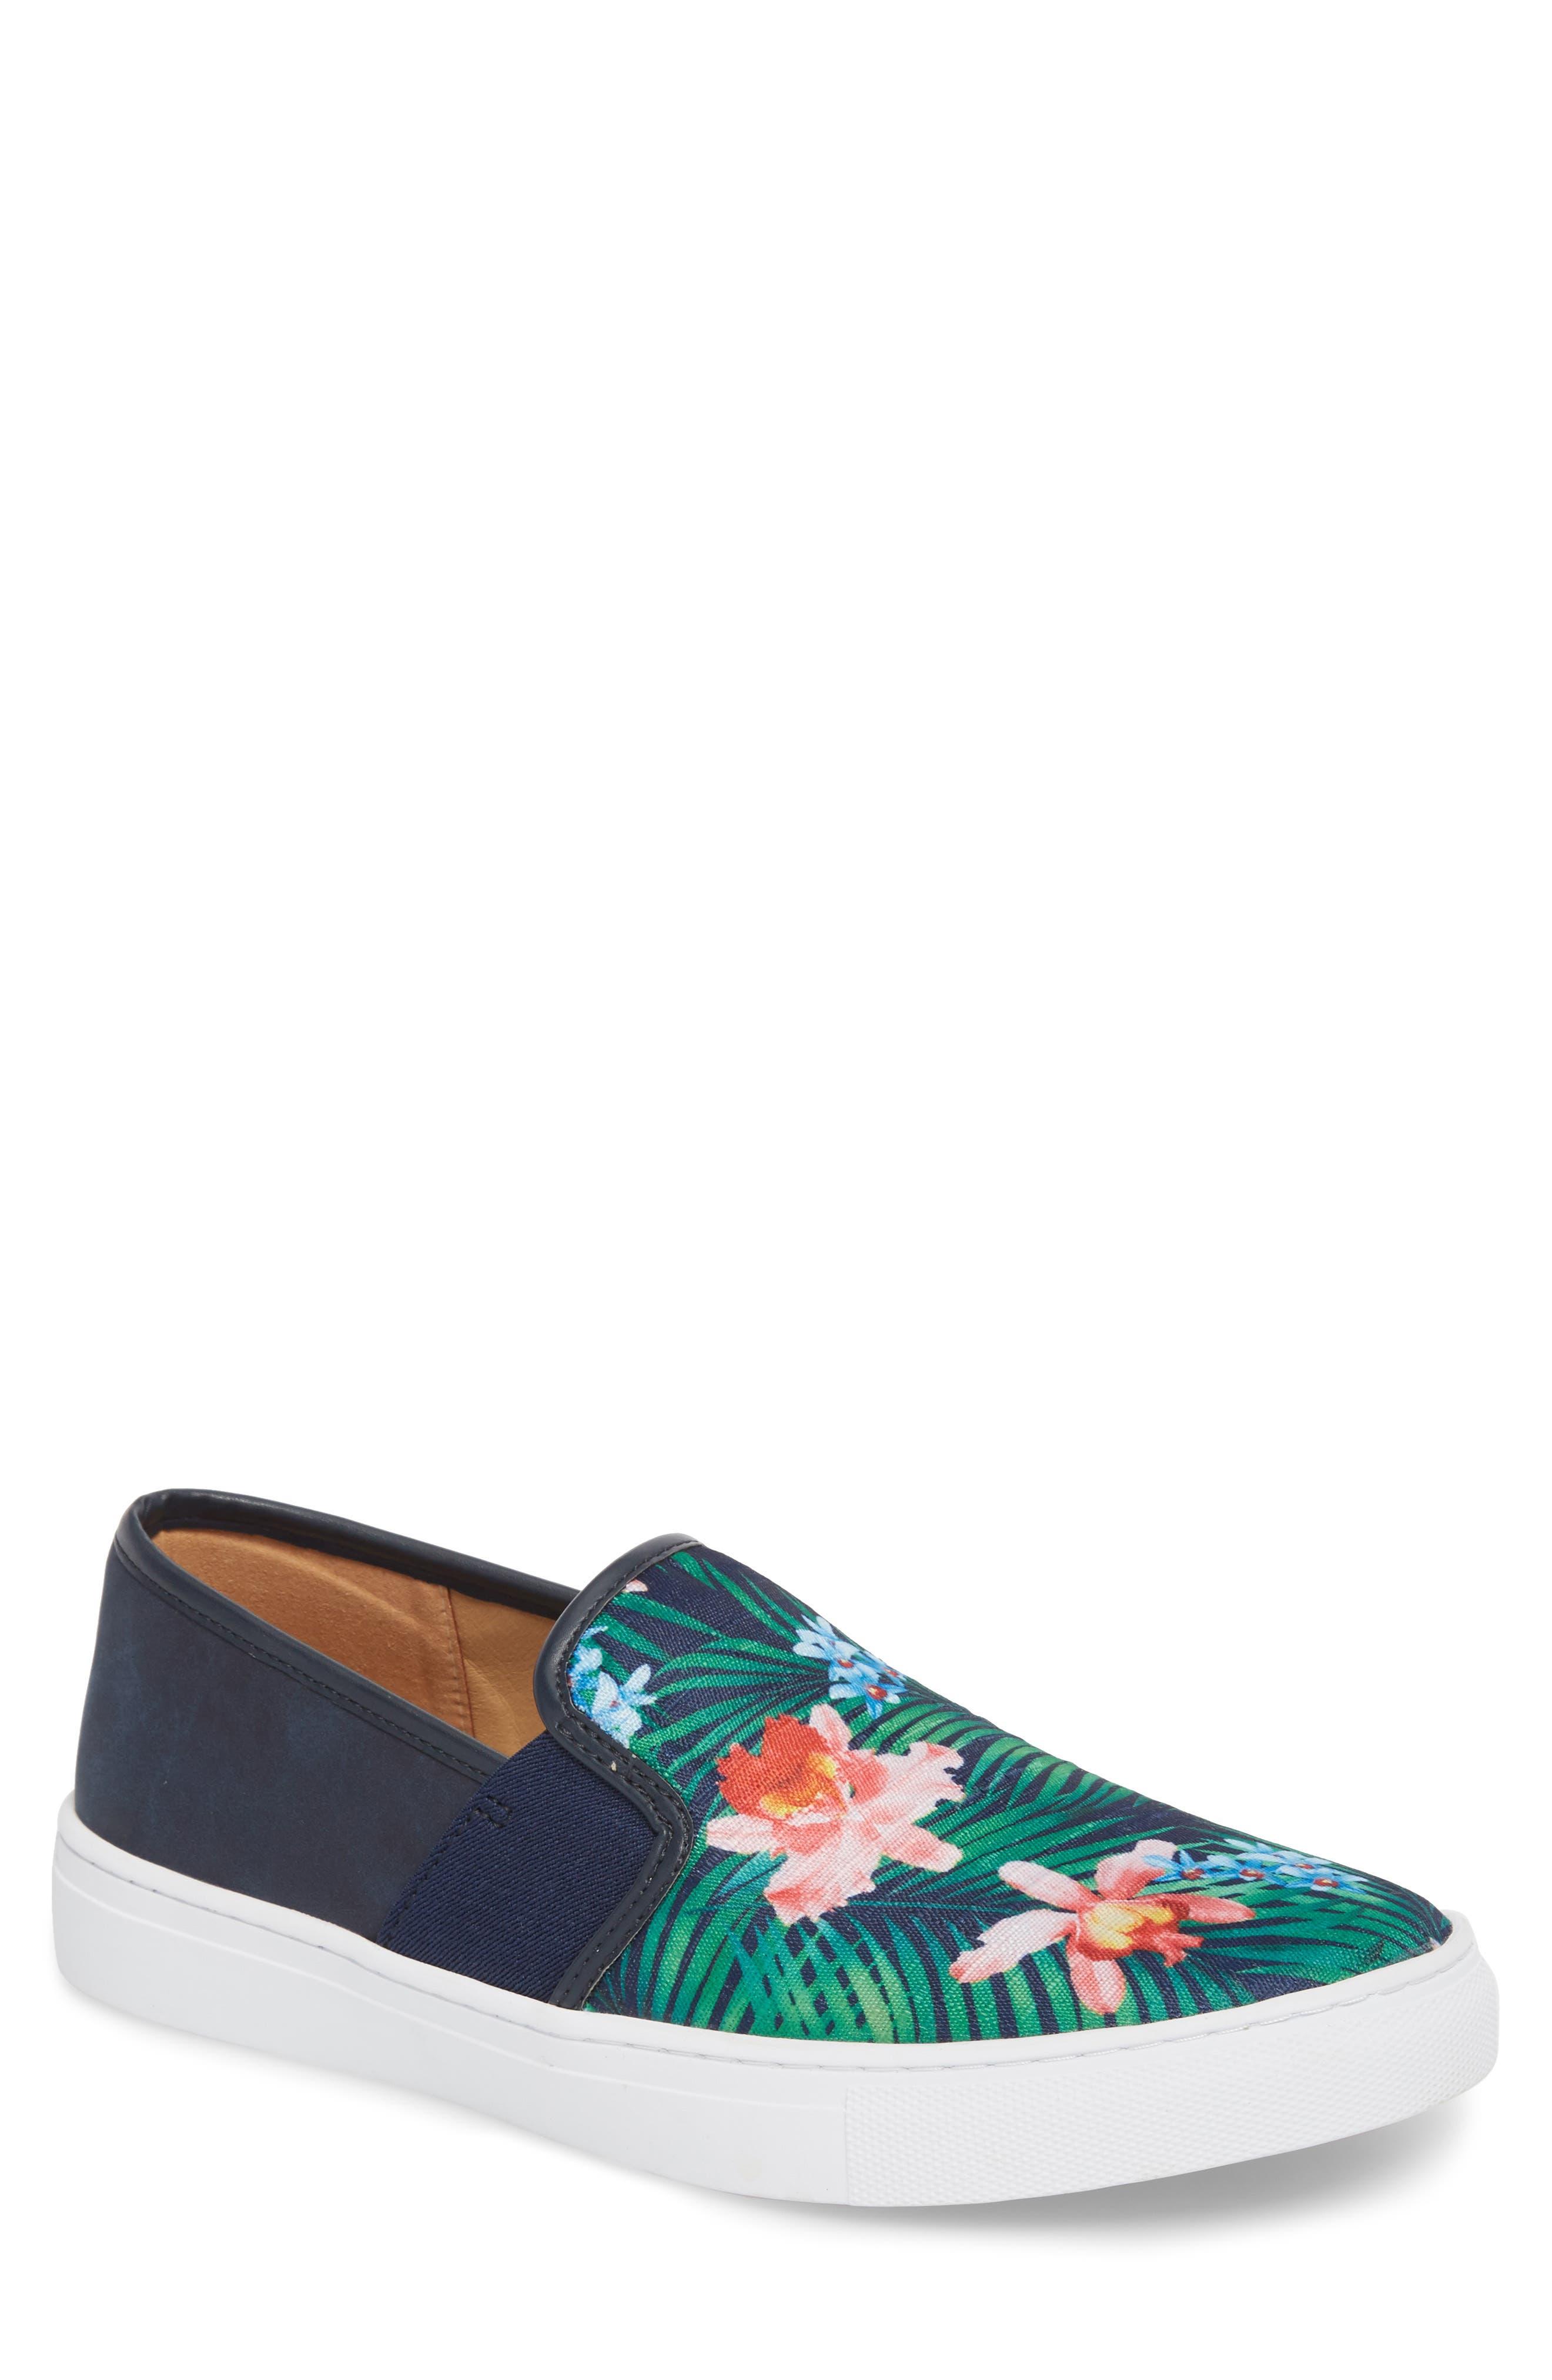 Fish 'N' Chips Bali Slip-On Sneaker,                             Main thumbnail 1, color,                             Navy Multi Fabric